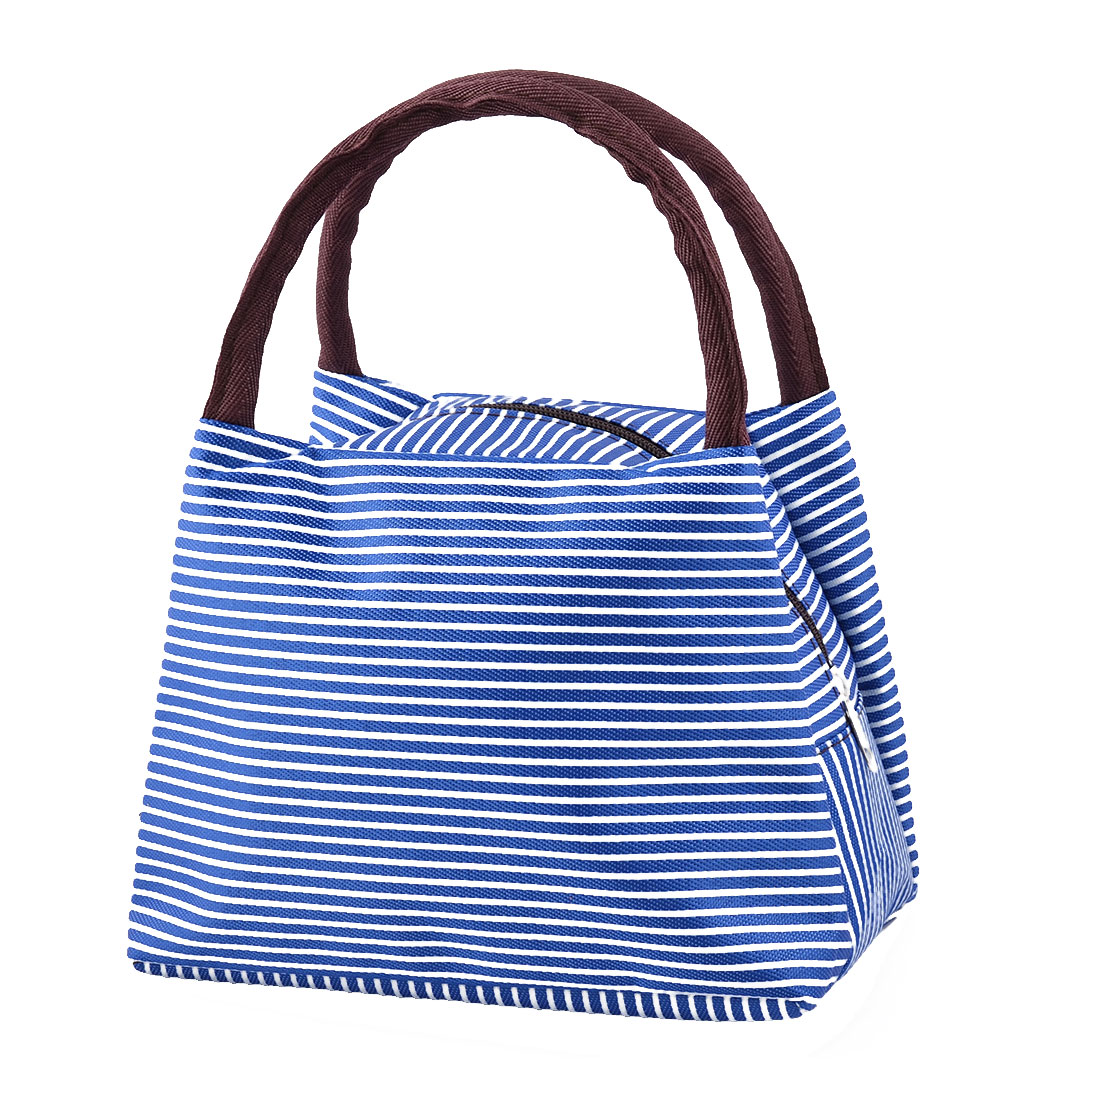 Outdoor Linen Cotton Stripe Pattern Lunch Holder Cooler Pouch Handbag Bag Blue